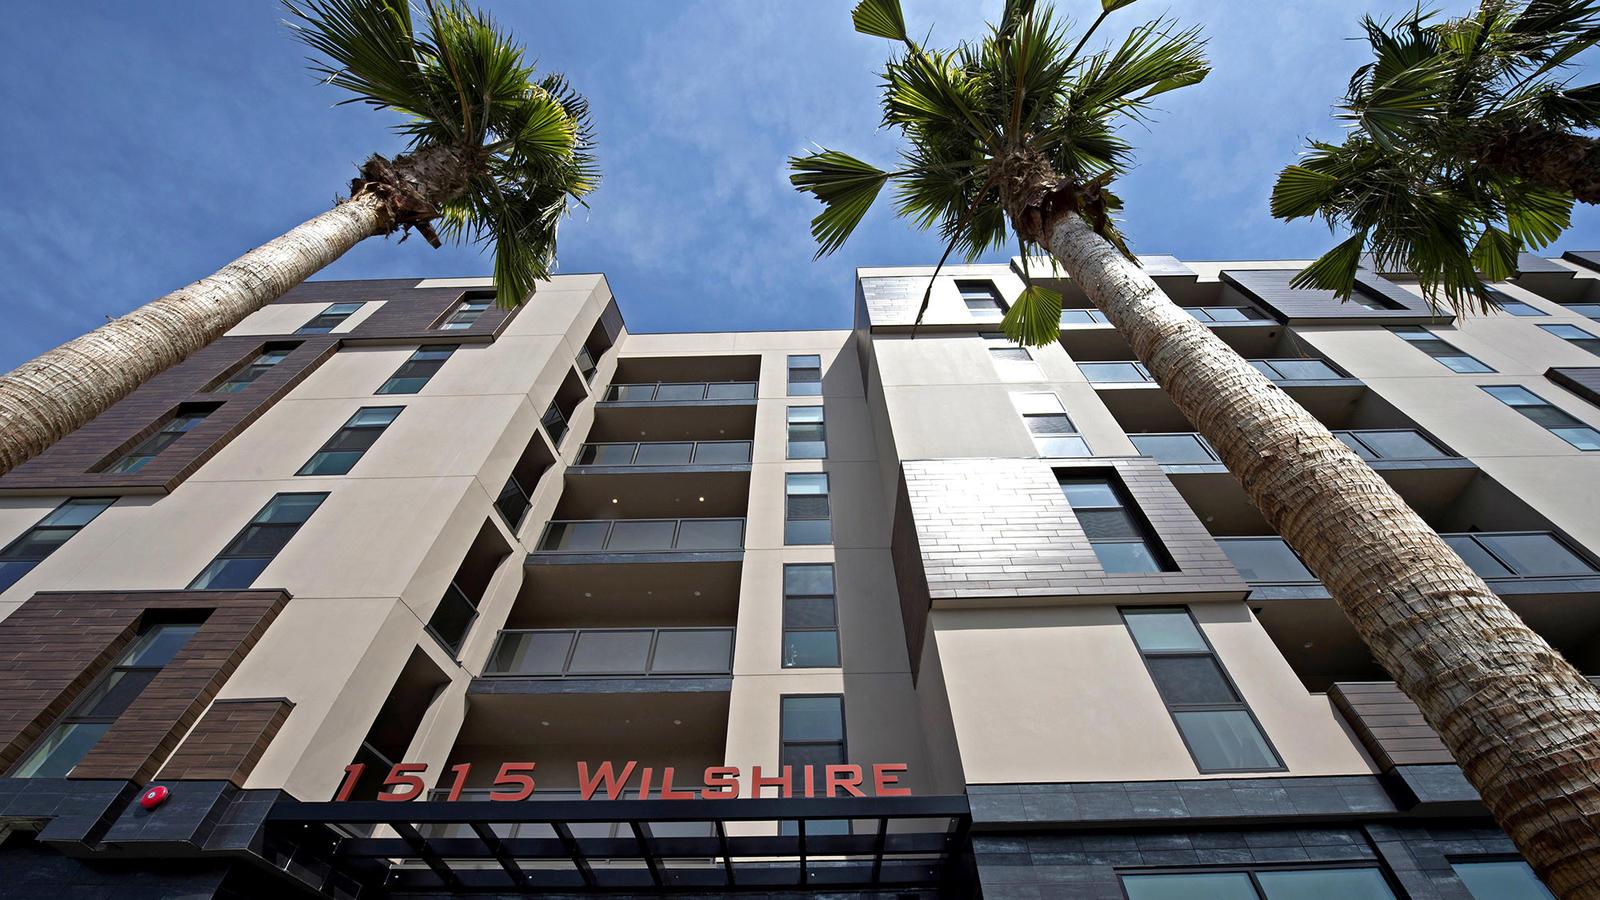 The Wilshire Valencia apartment complex at 1515 Wilshire Blvd. in Los Angeles. (Gary Leonard / Astani Enterprises)